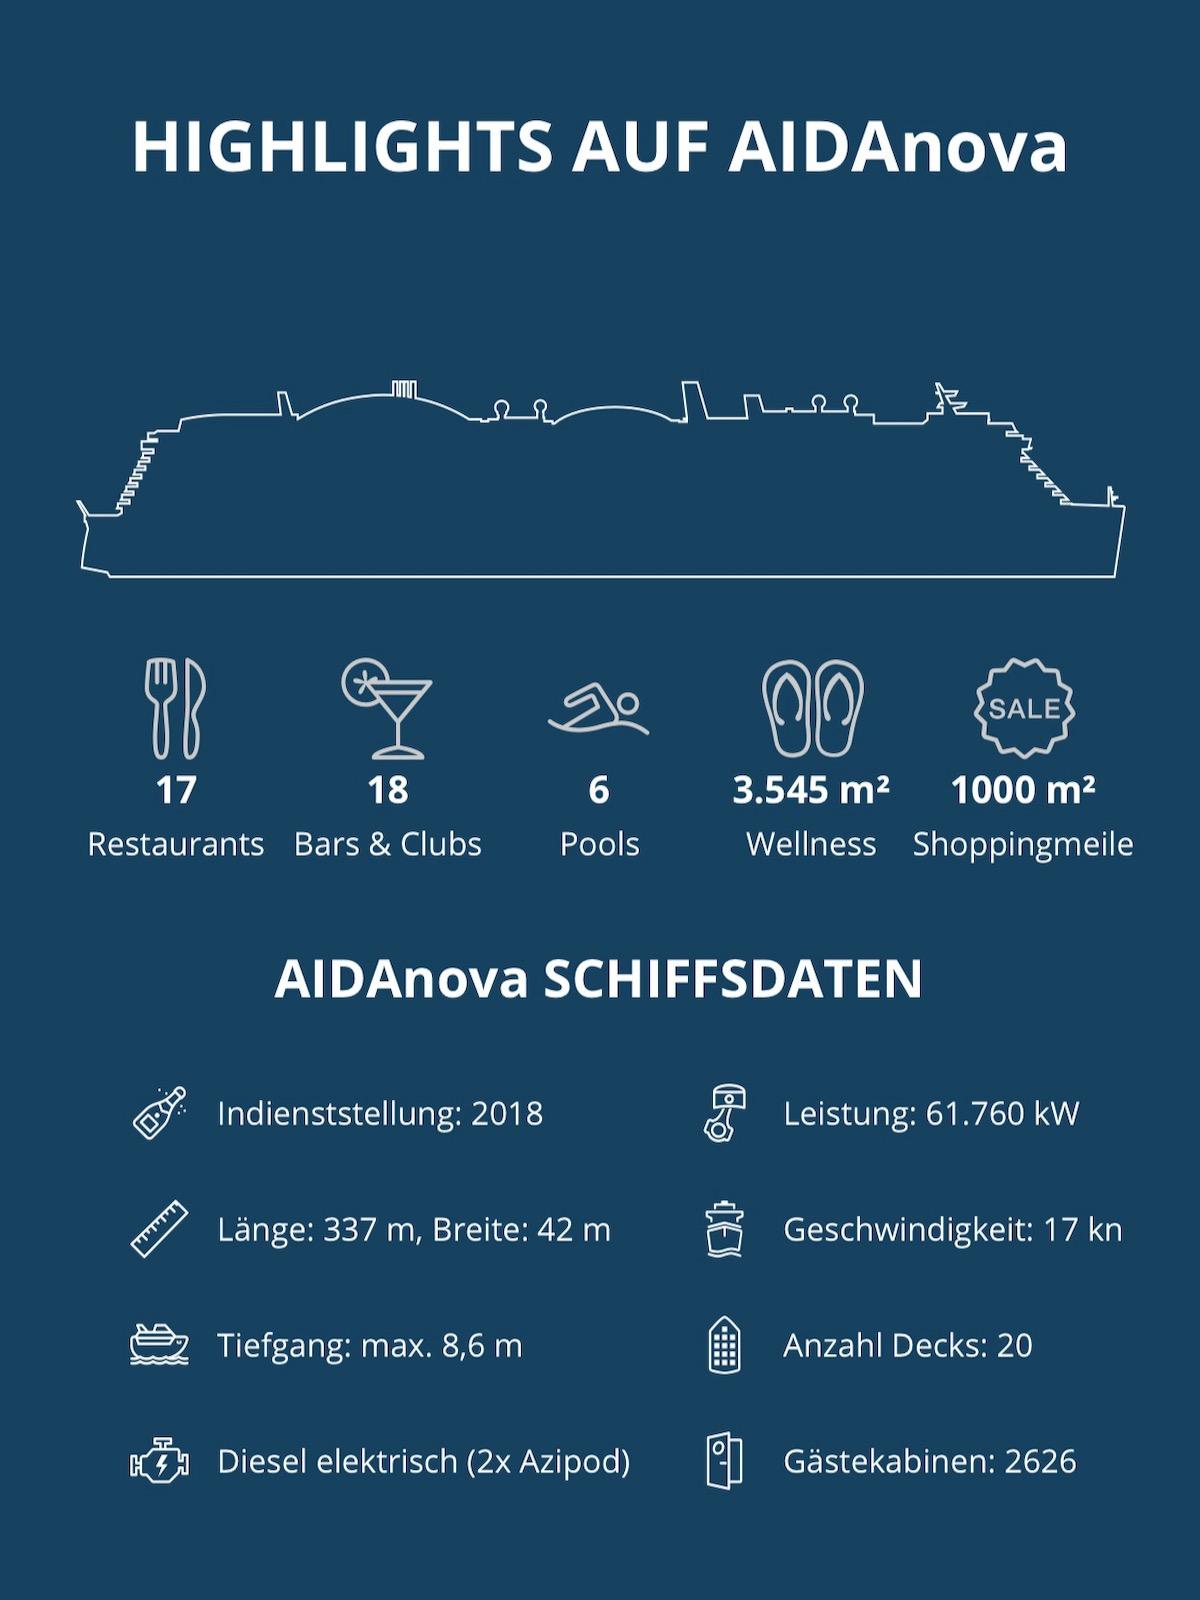 aida-cruises-ships-aidanova-daten-mobil